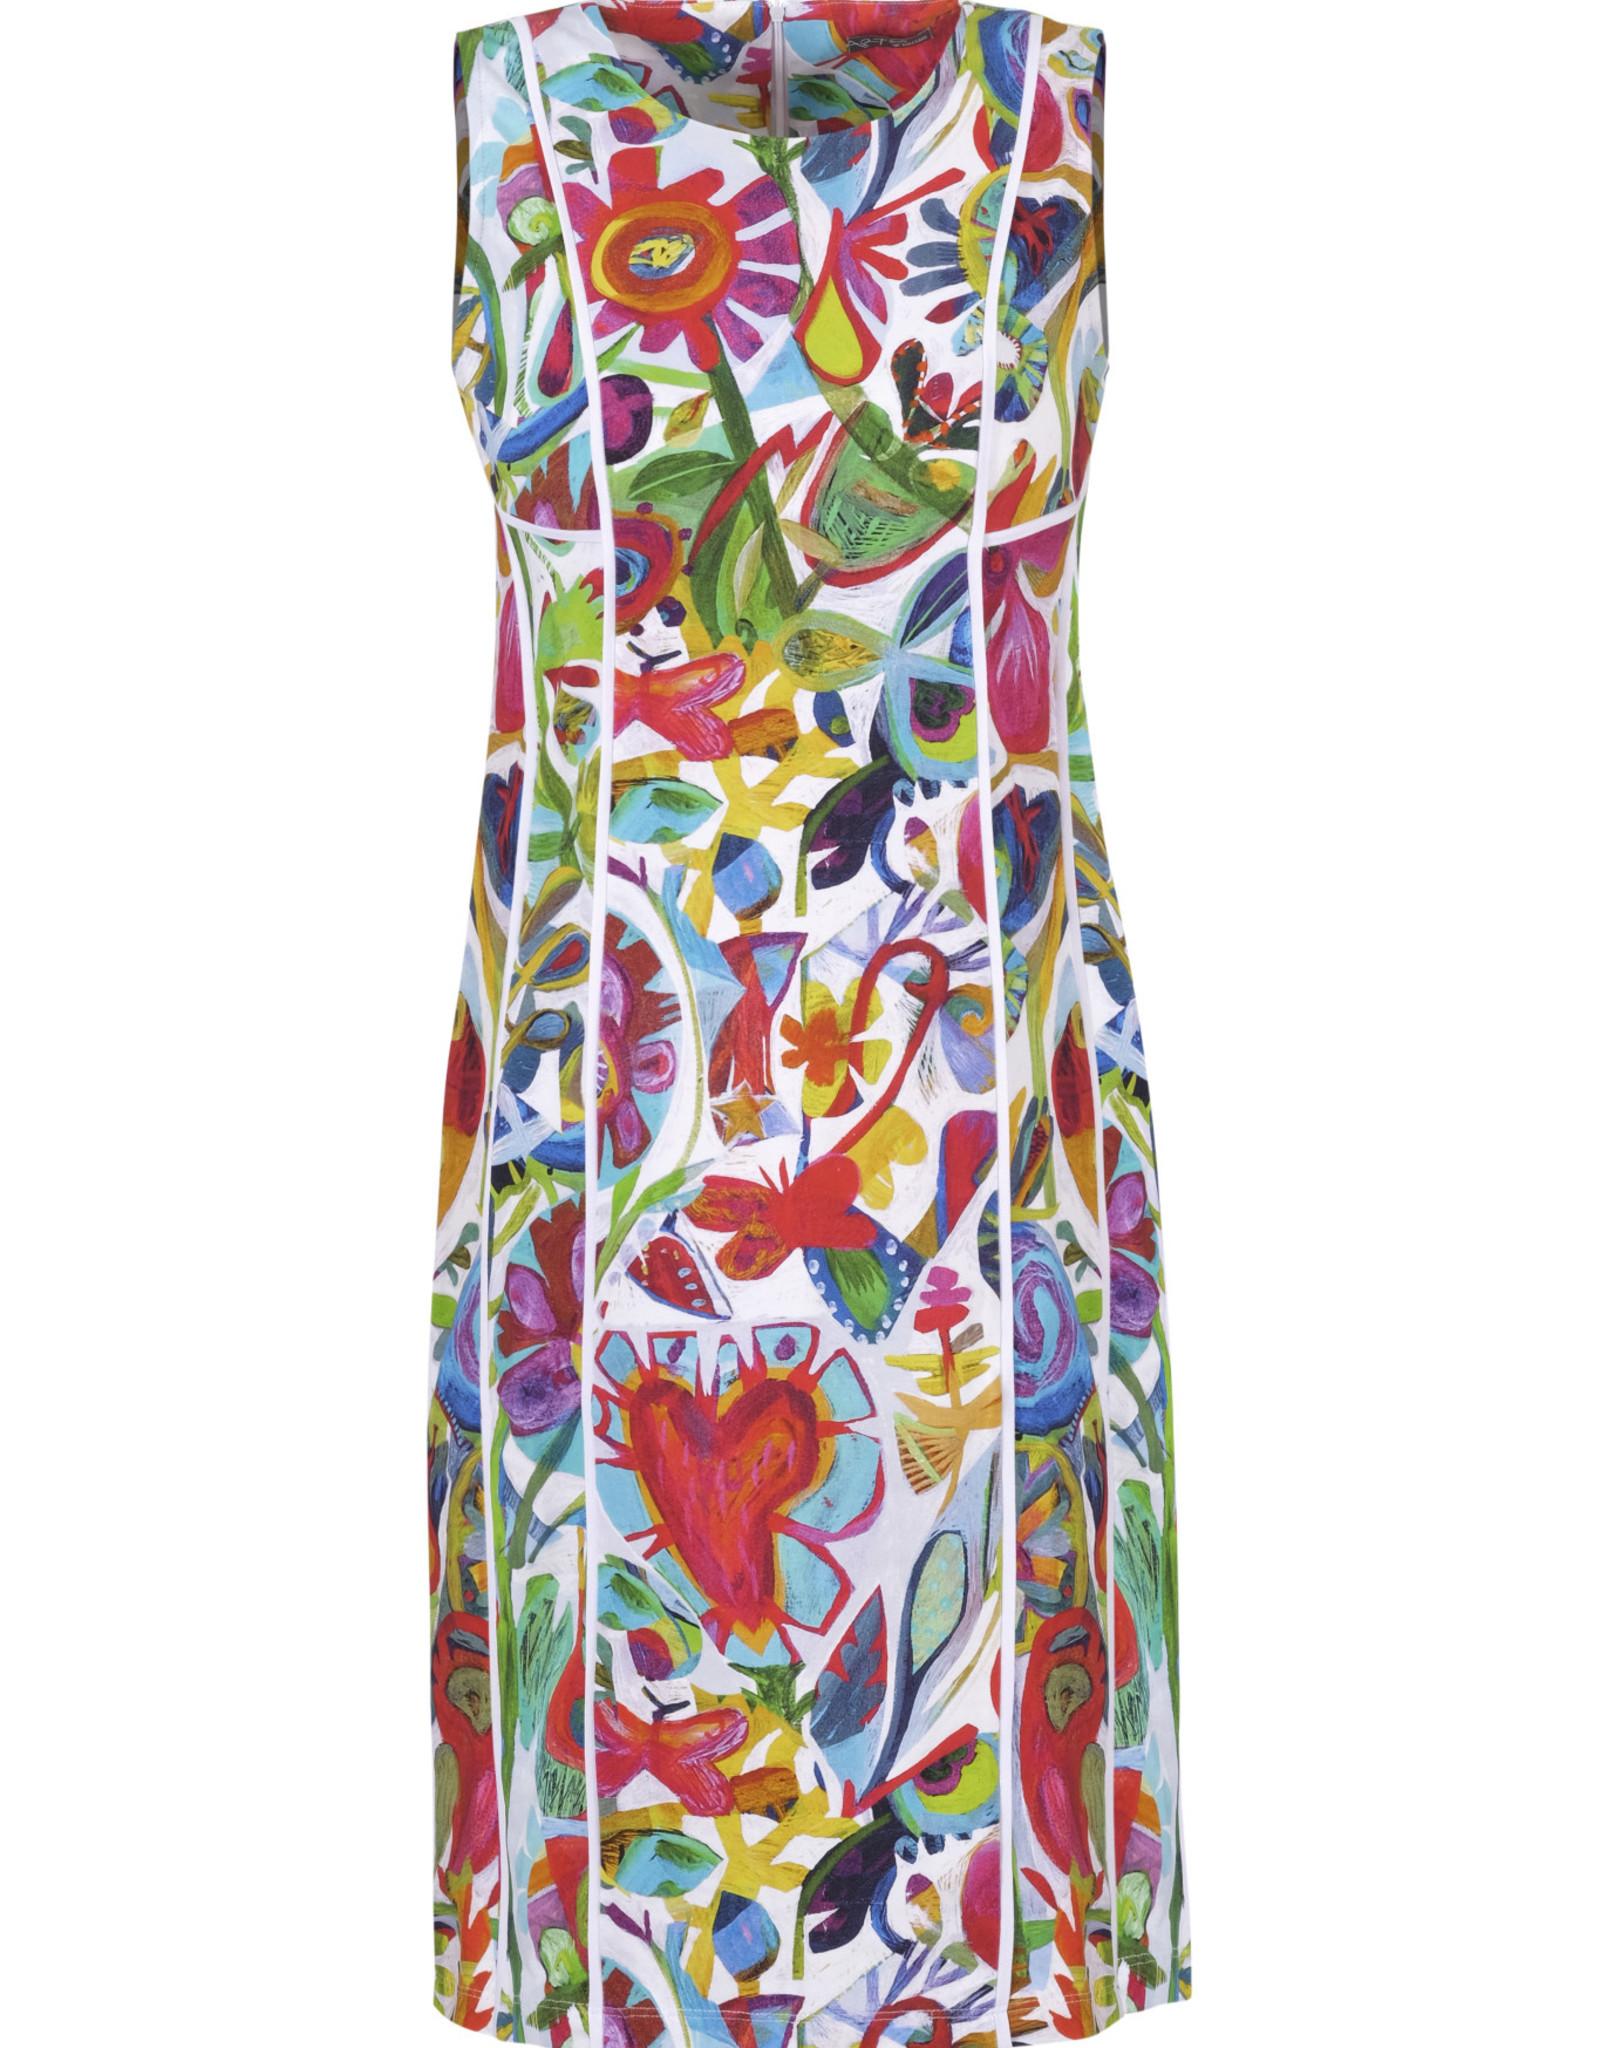 Dolcezza 21624 Print Art Dress